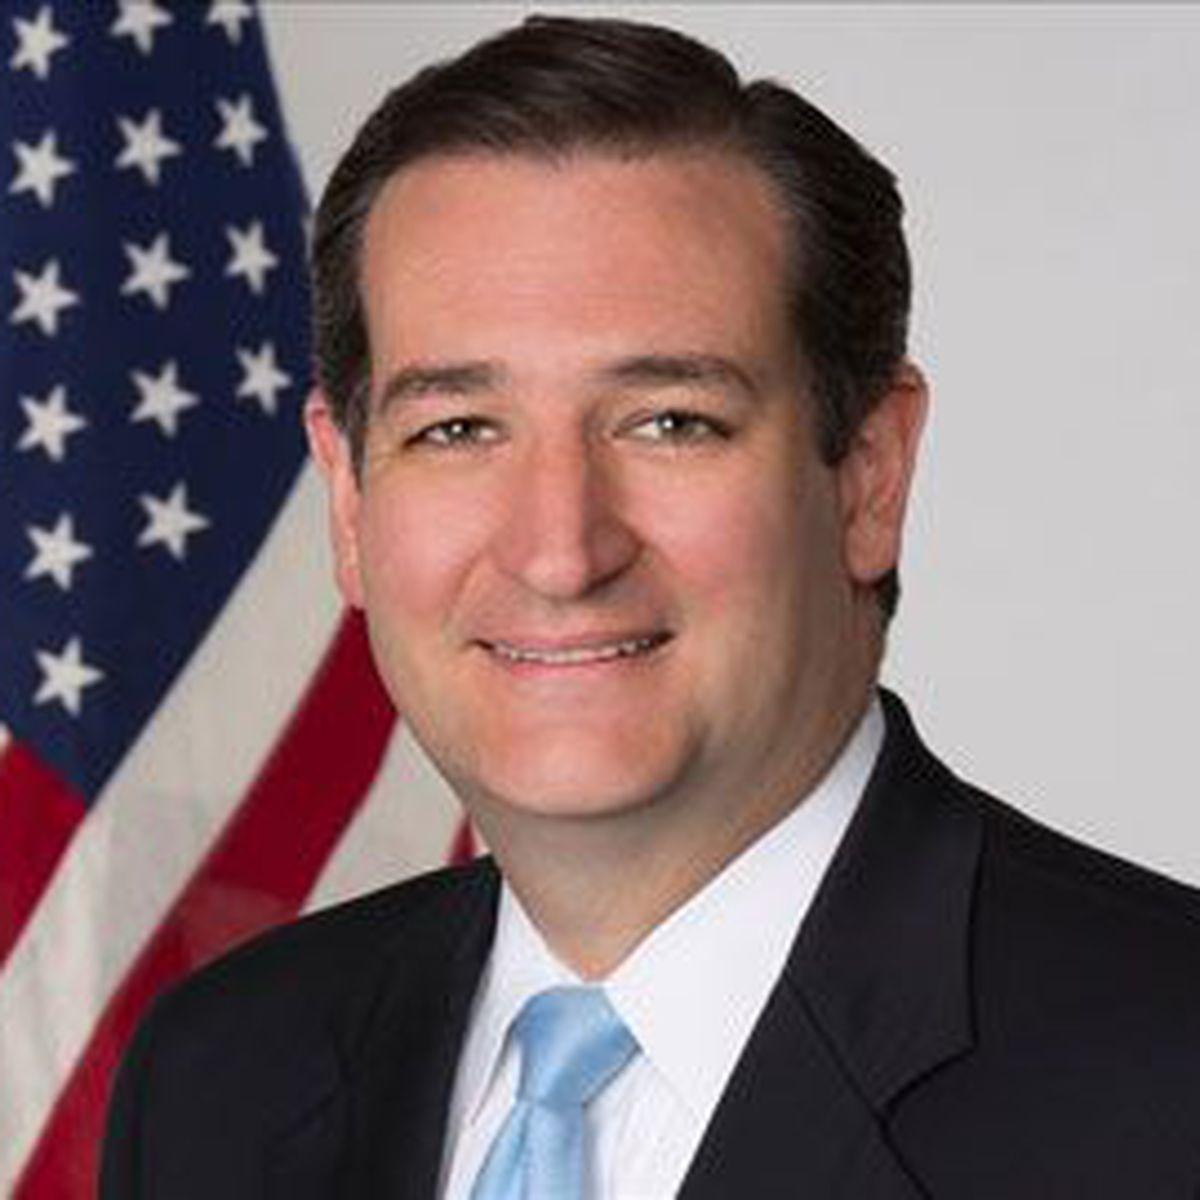 Senator Ted Cruz to be in Lufkin, Nacogdoches Tuesday